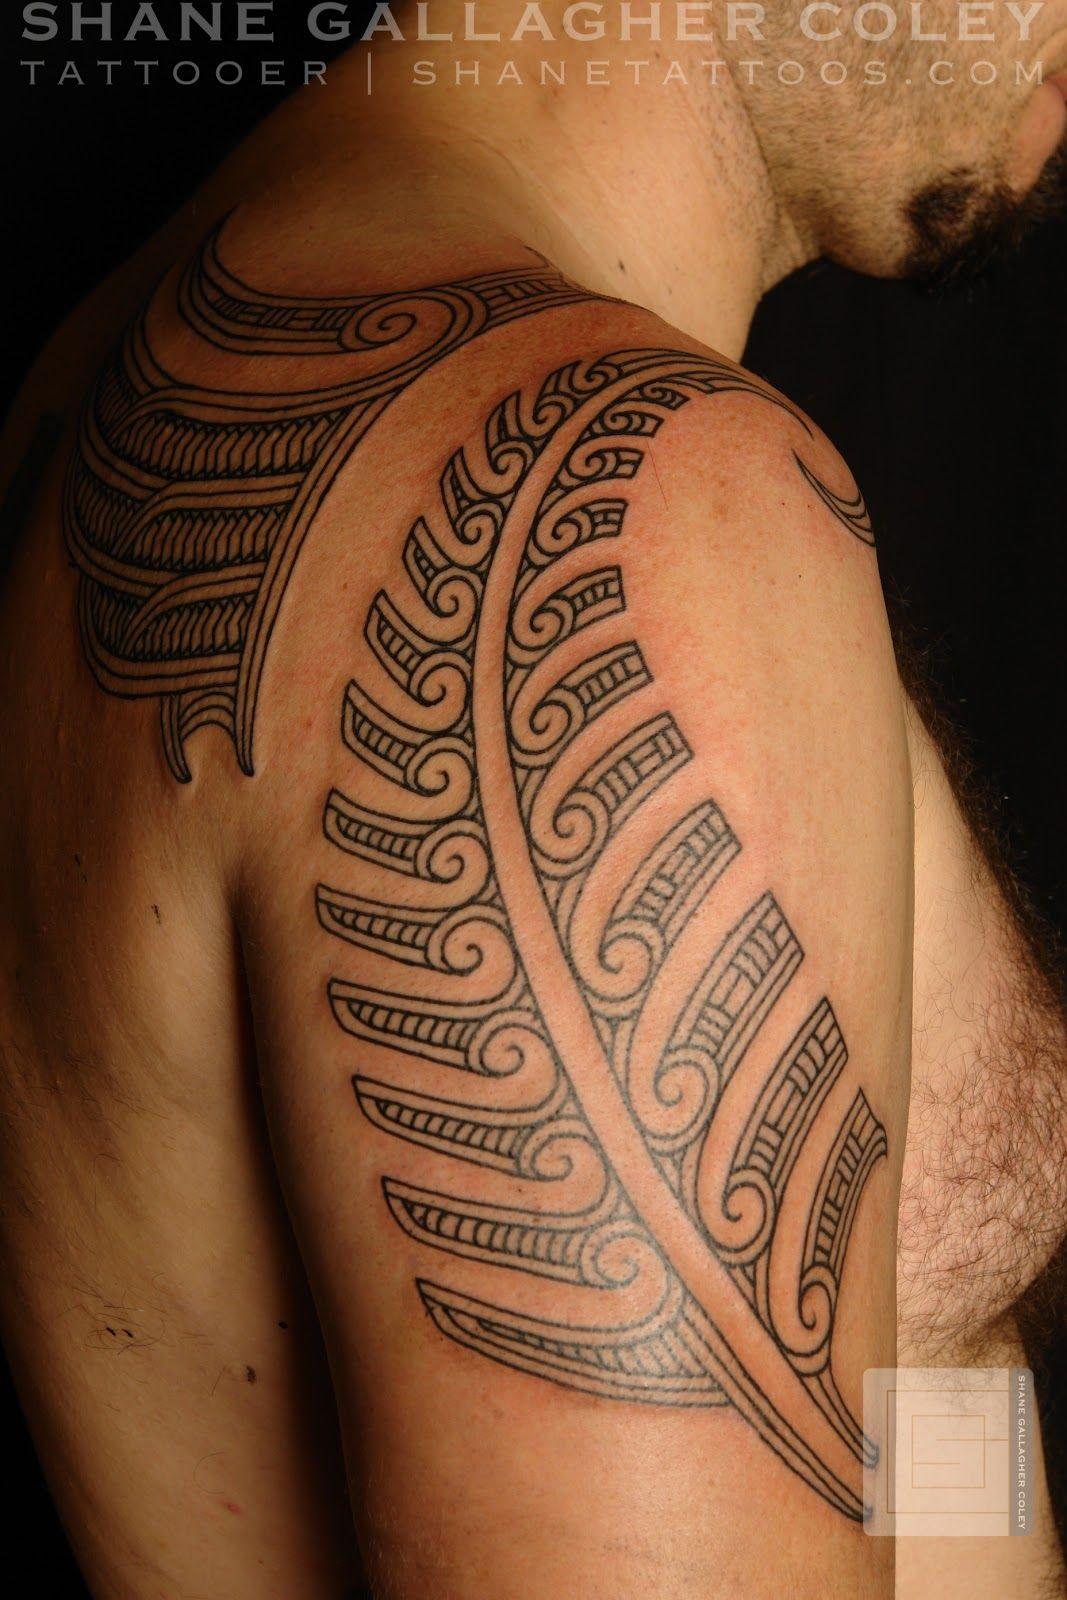 Maori Feather Tattoo: Maori Tattoo By Shane Gallagher